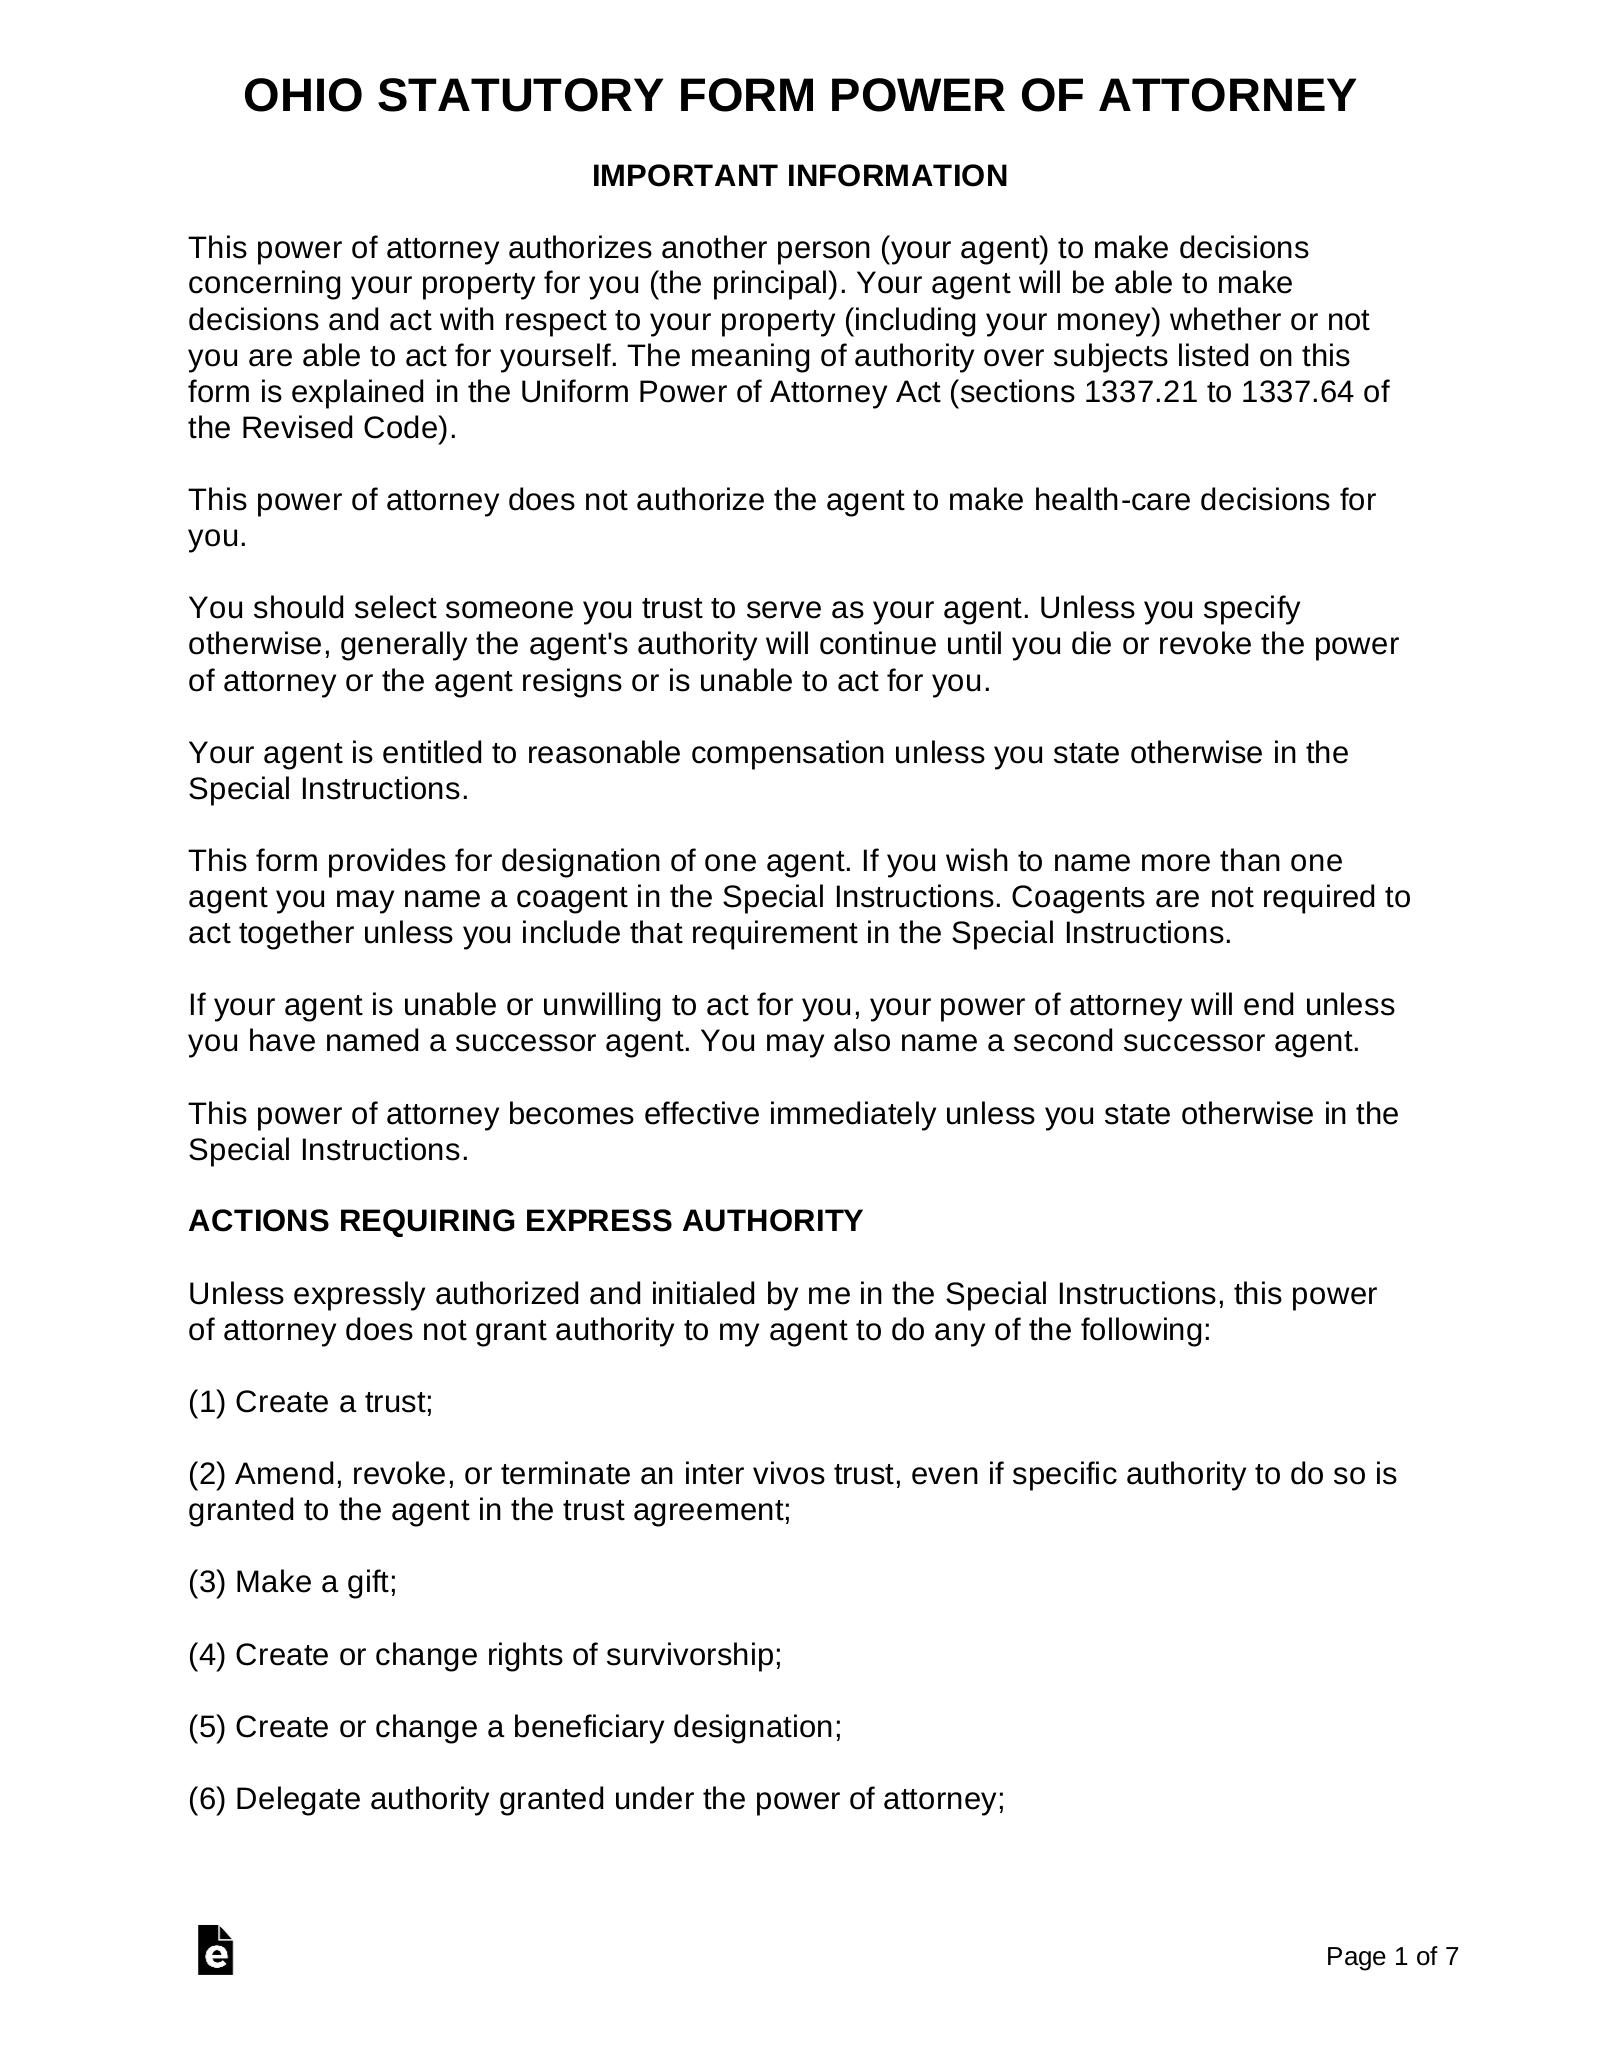 Free Ohio Power Of Attorney Forms Word PDF EForms